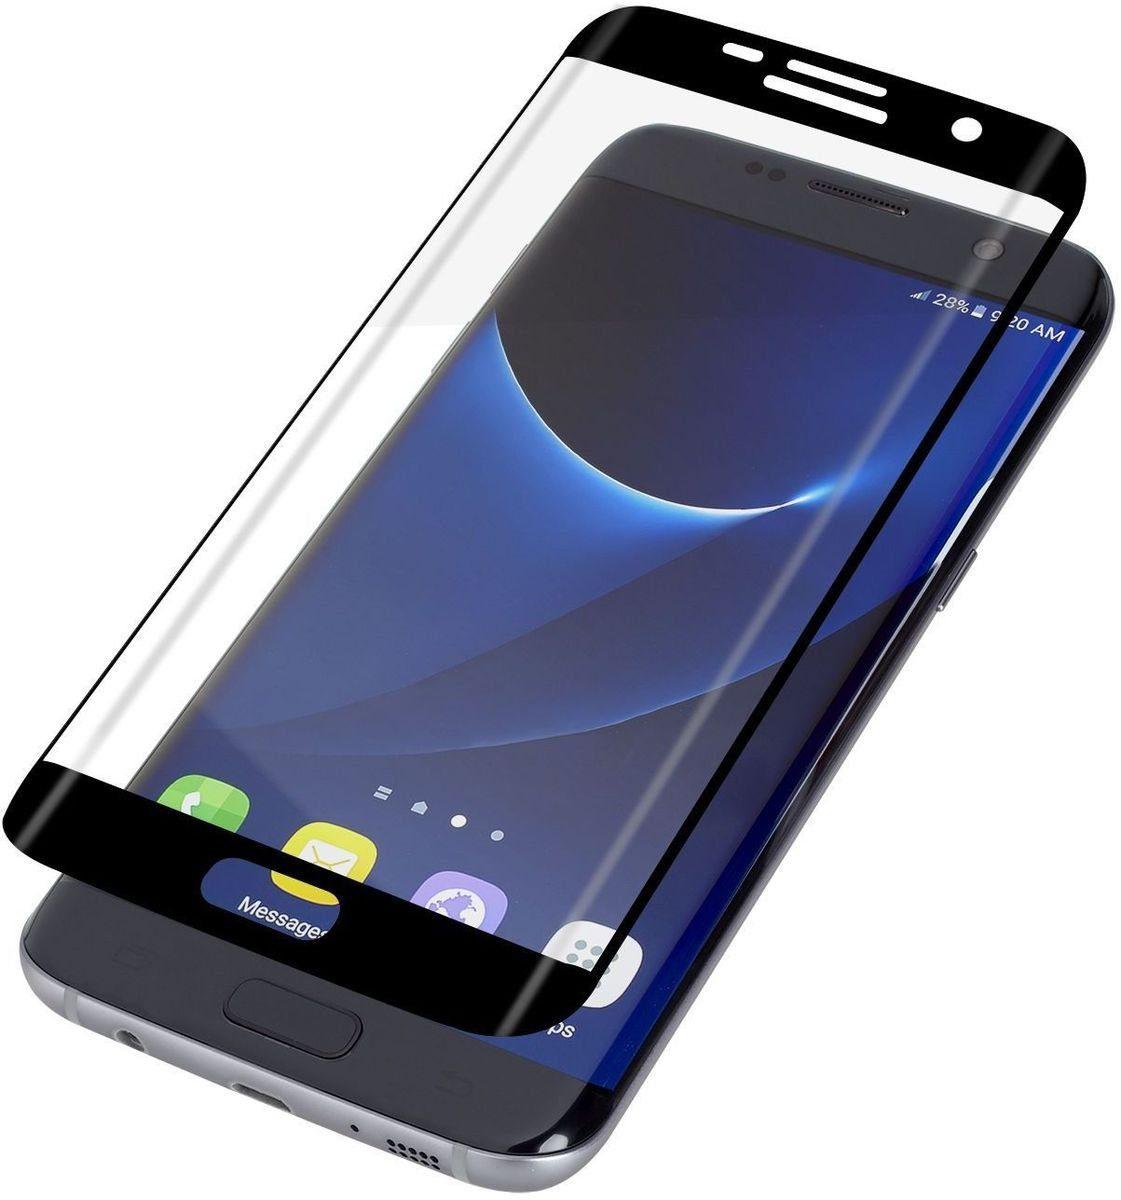 invisibleSHIELD Folie »Contour Glass für Galaxy S7 edge«